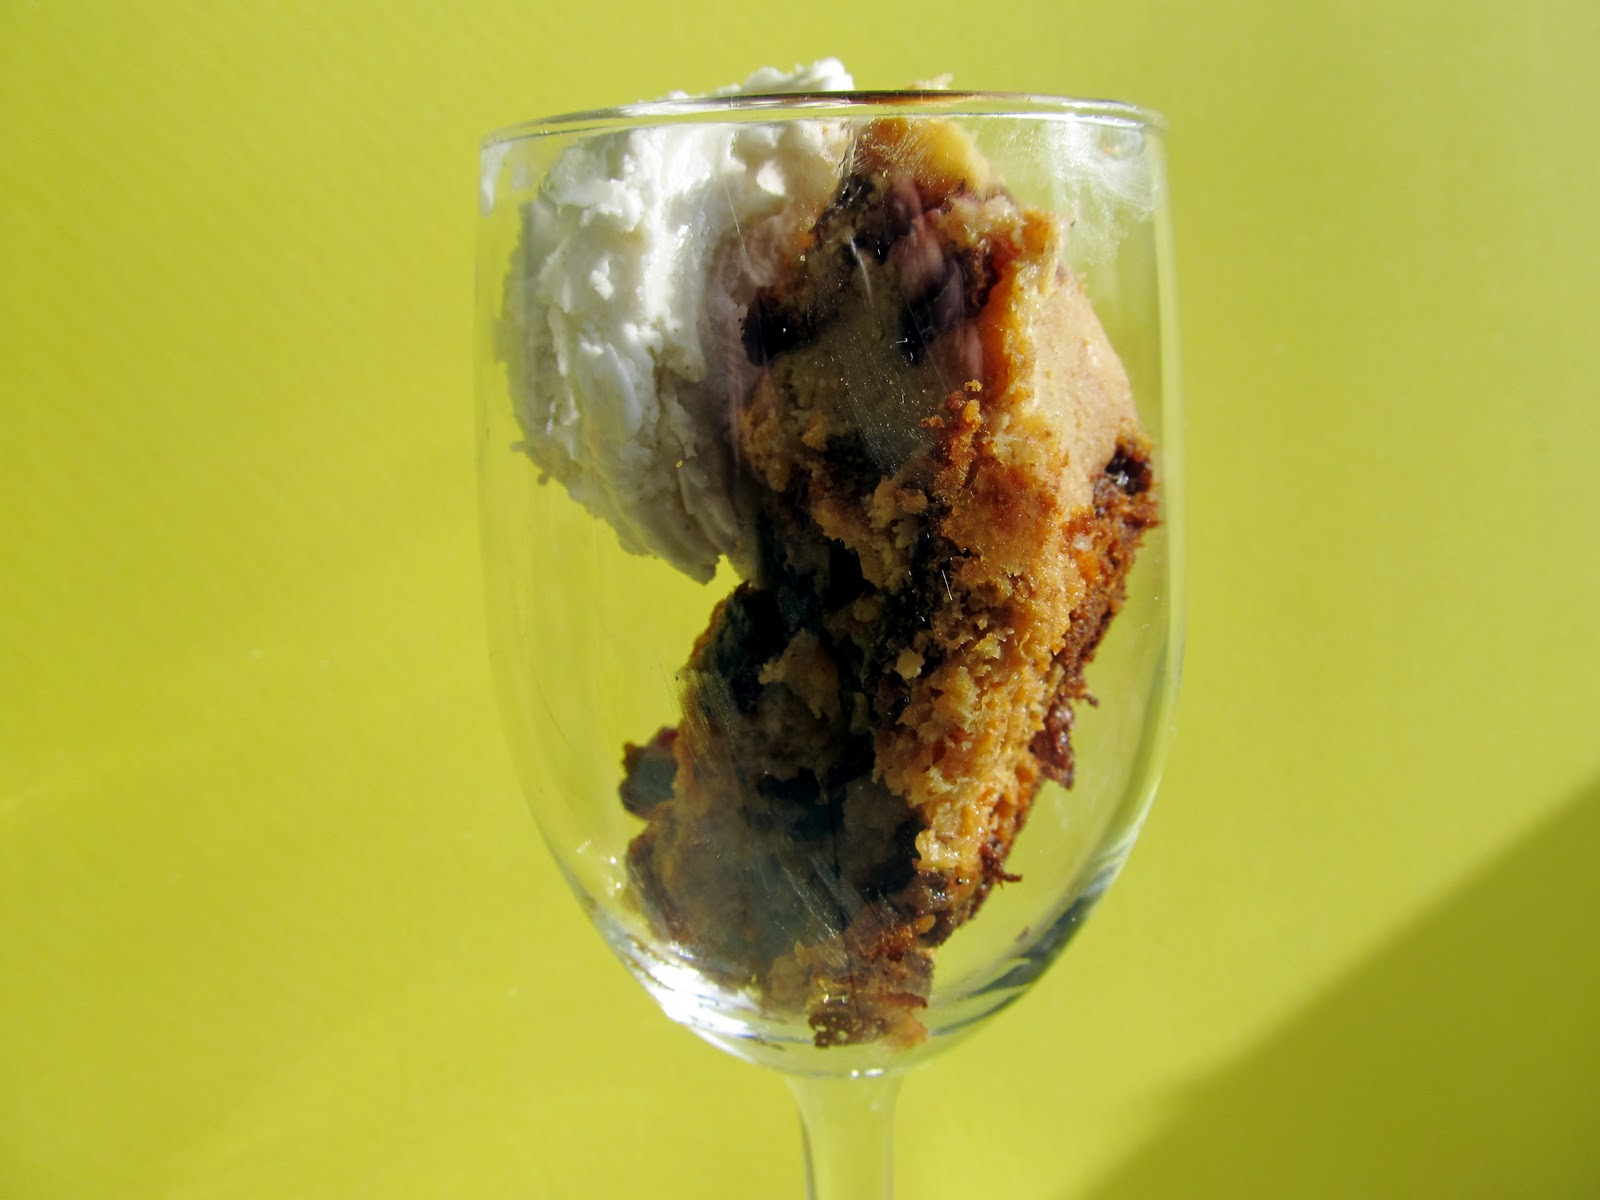 Mary Quite Contrary Bakes: Post 001. Panettone Eggnog ...